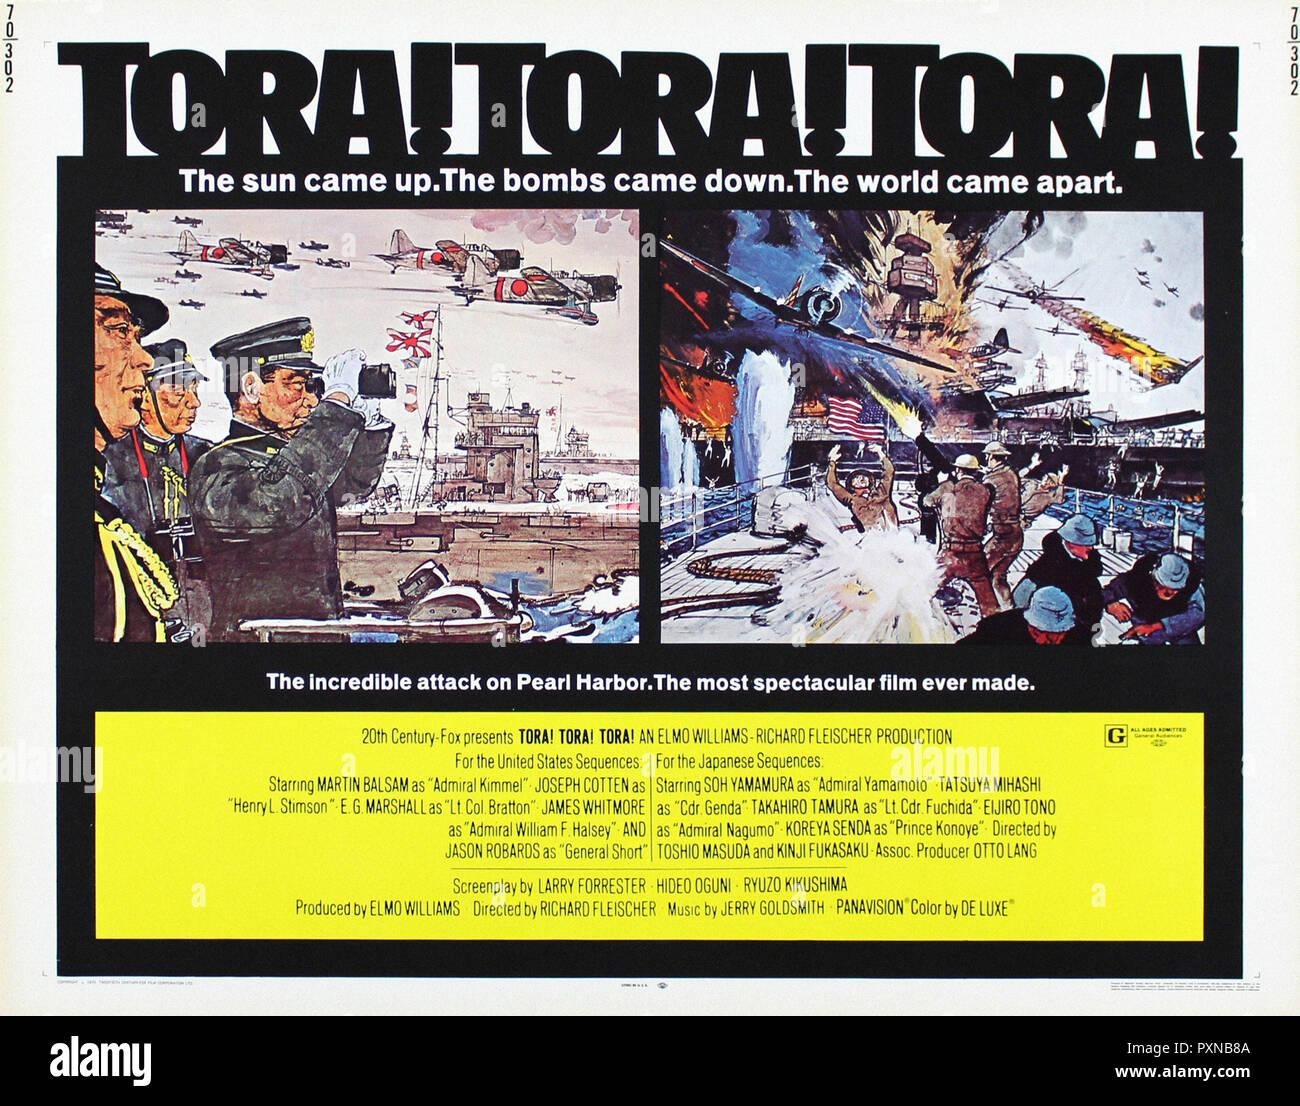 Tora Tora Tora A Surprise Attack On Pearl Harbor Begins Youtube